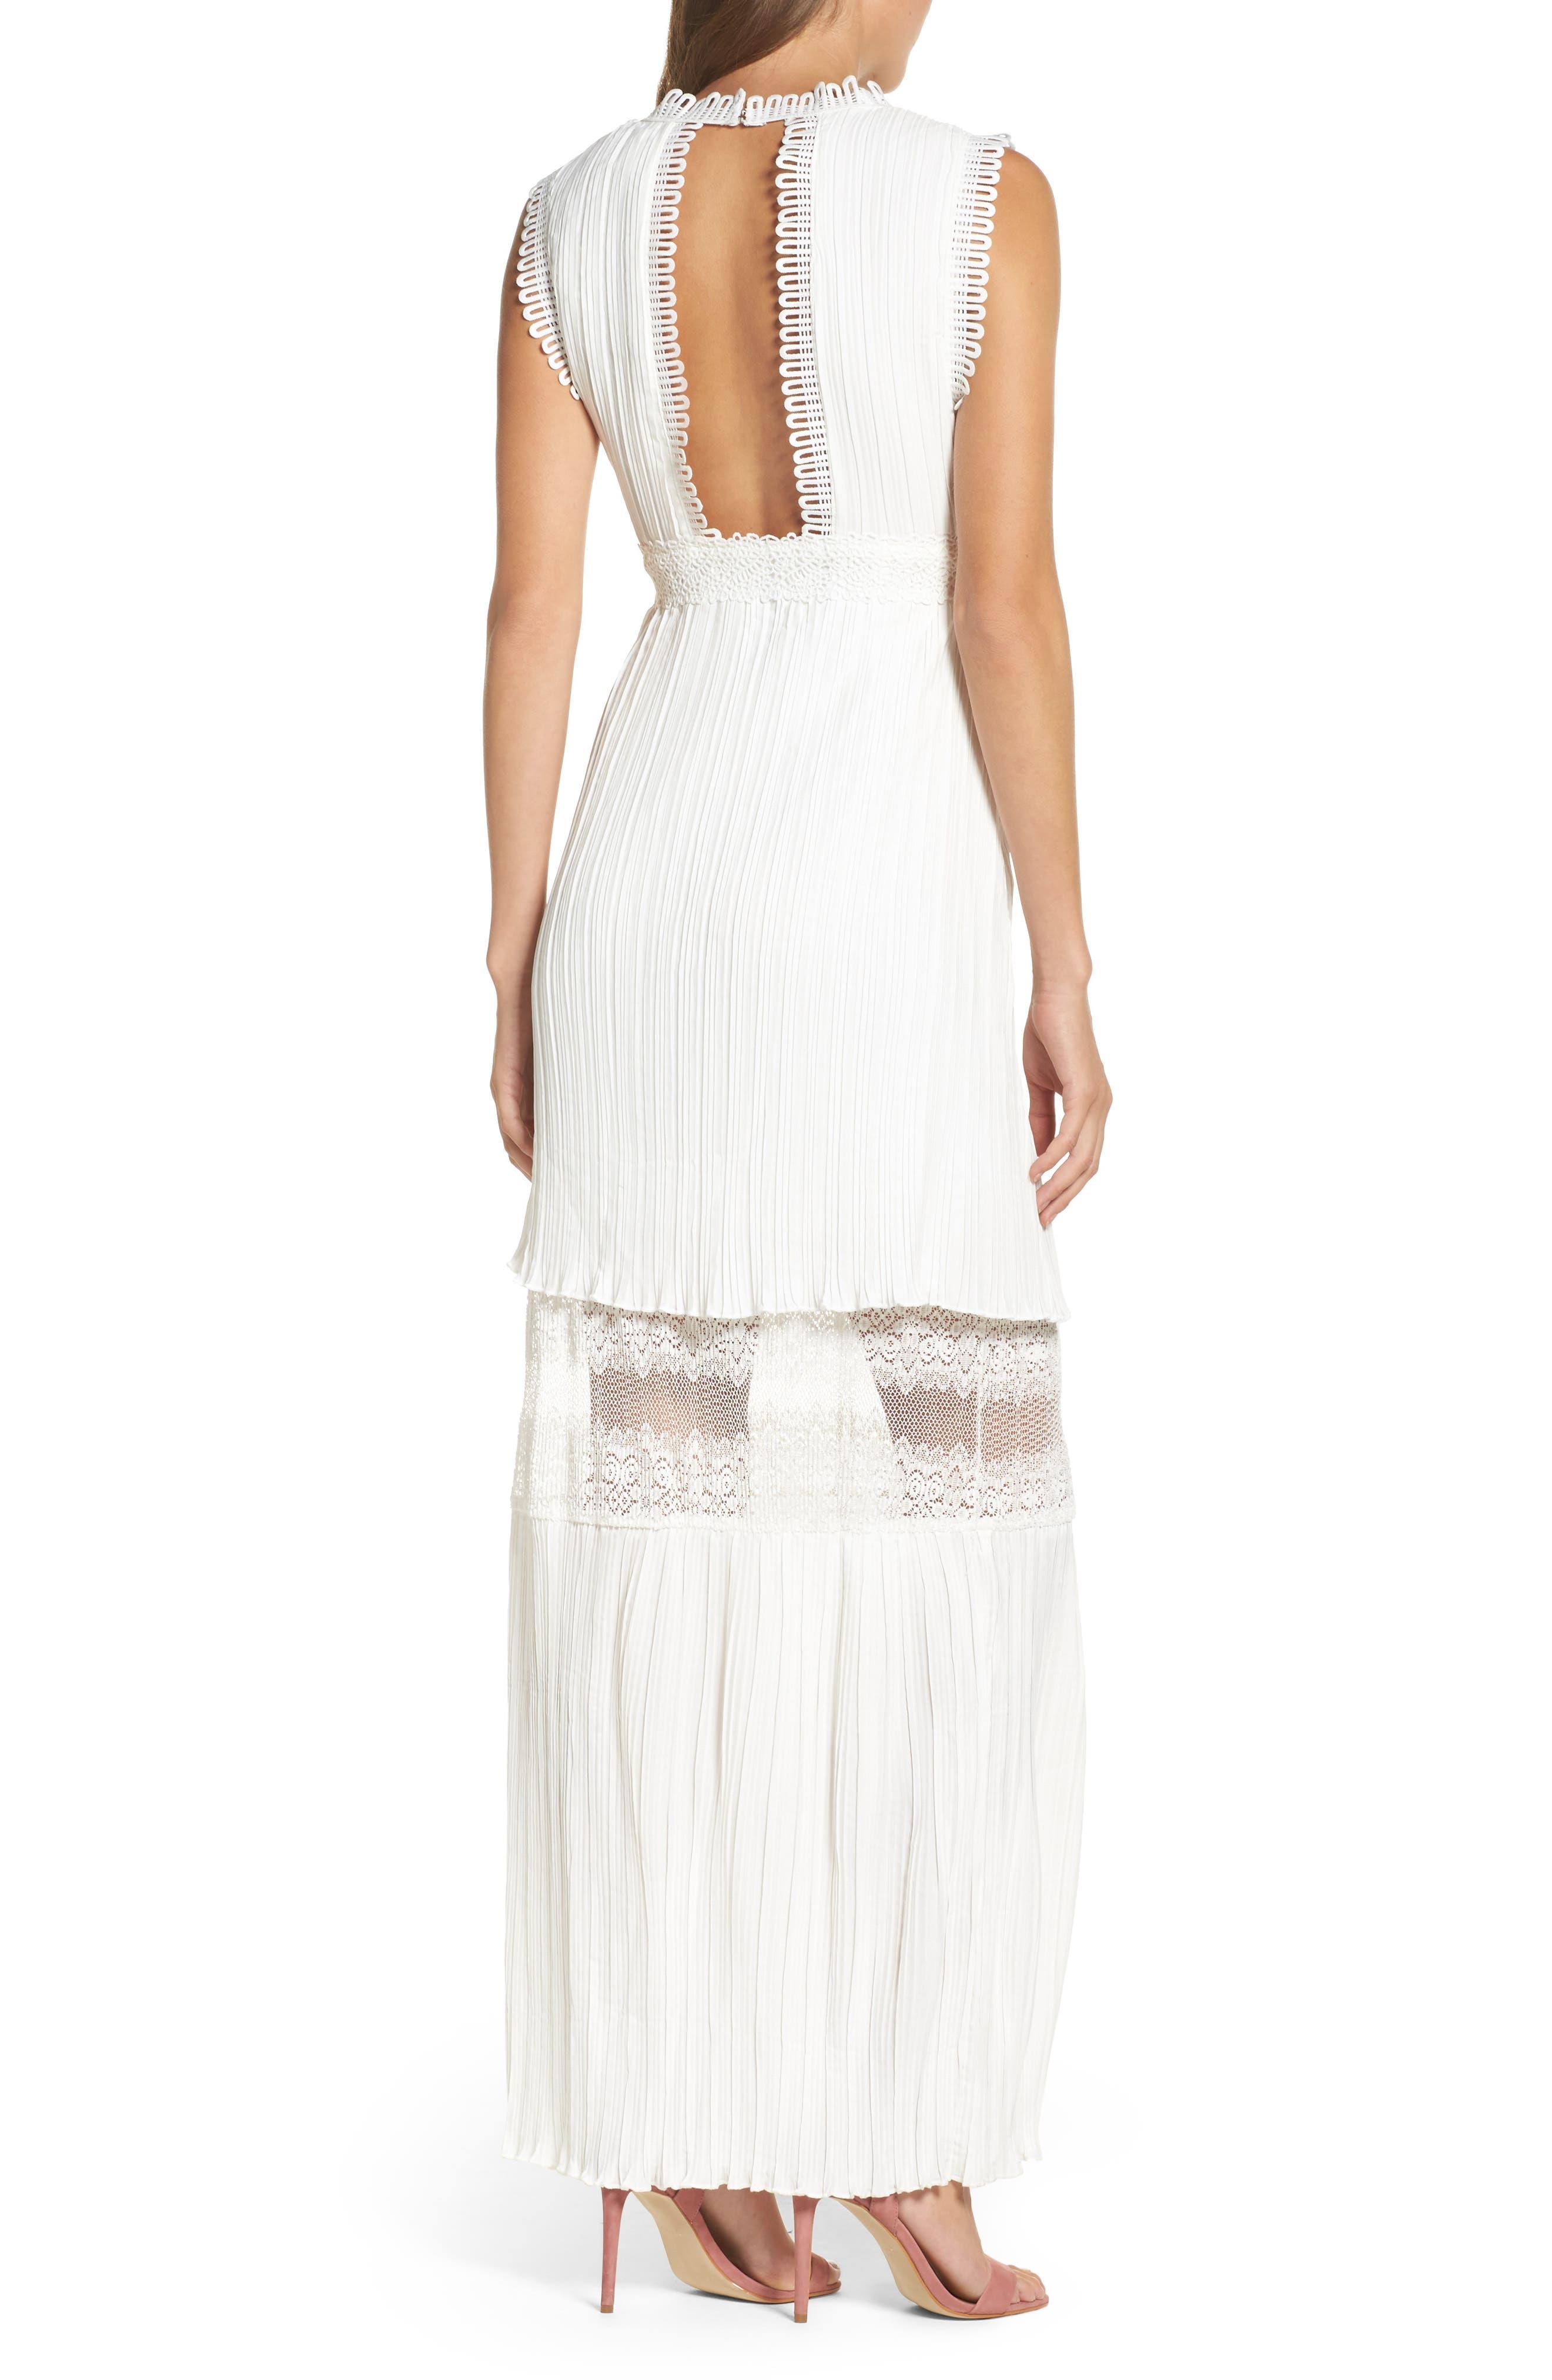 Jasmine Lace Inset Pleated Dress,                             Alternate thumbnail 2, color,                             Ivory